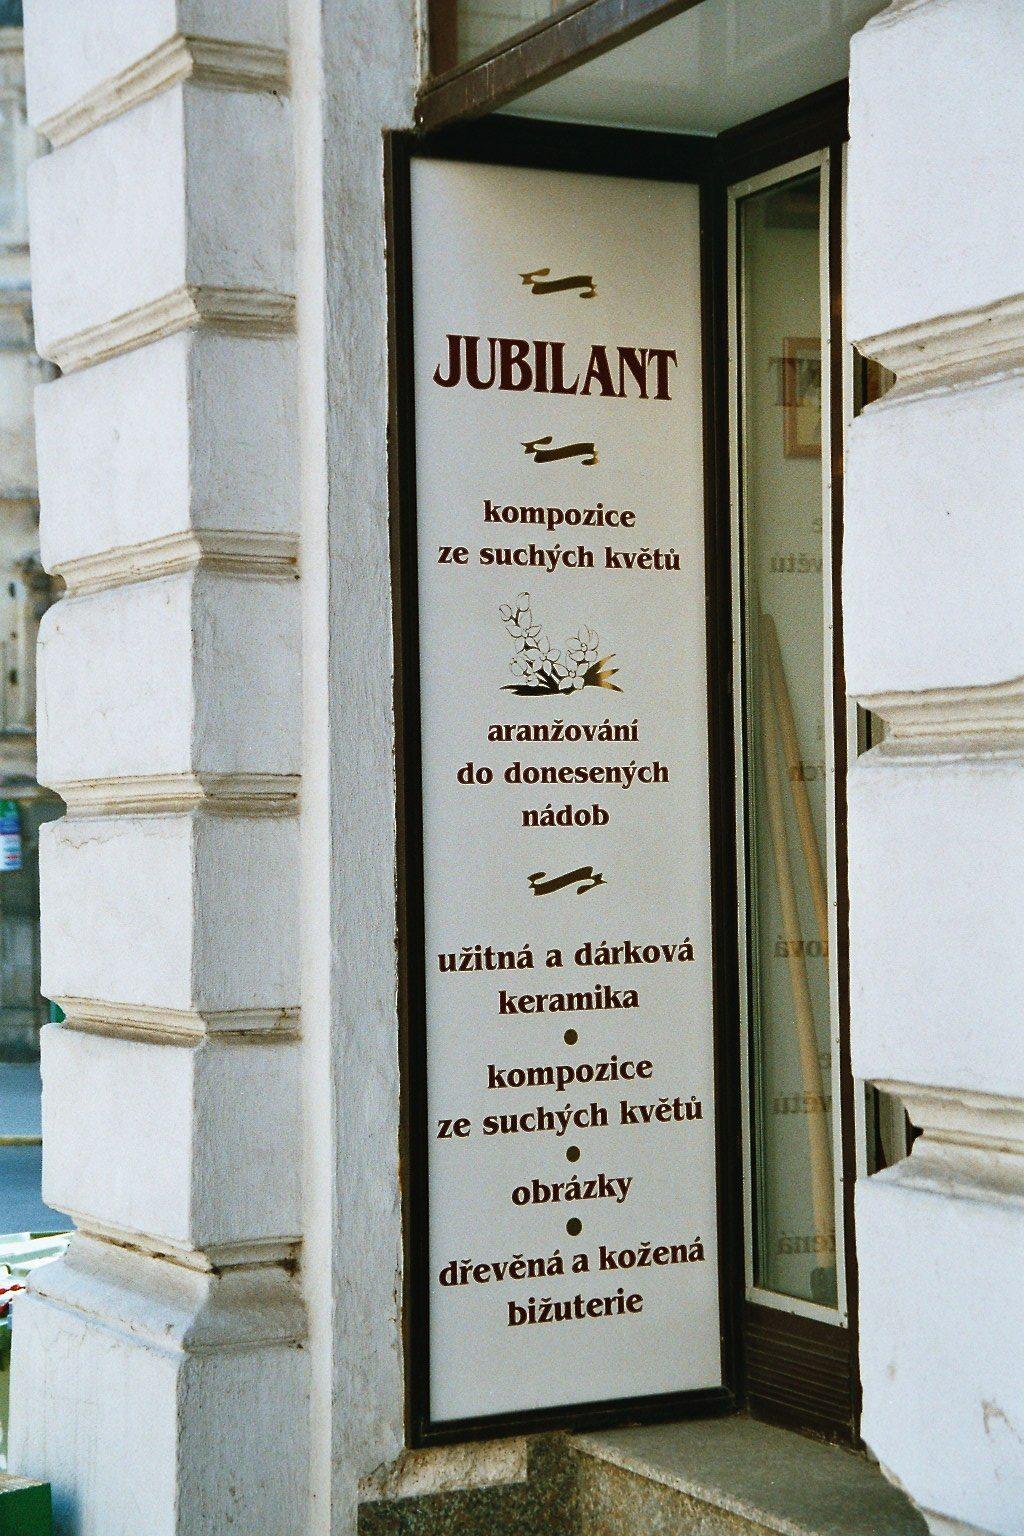 Novy Bor - Jubilant